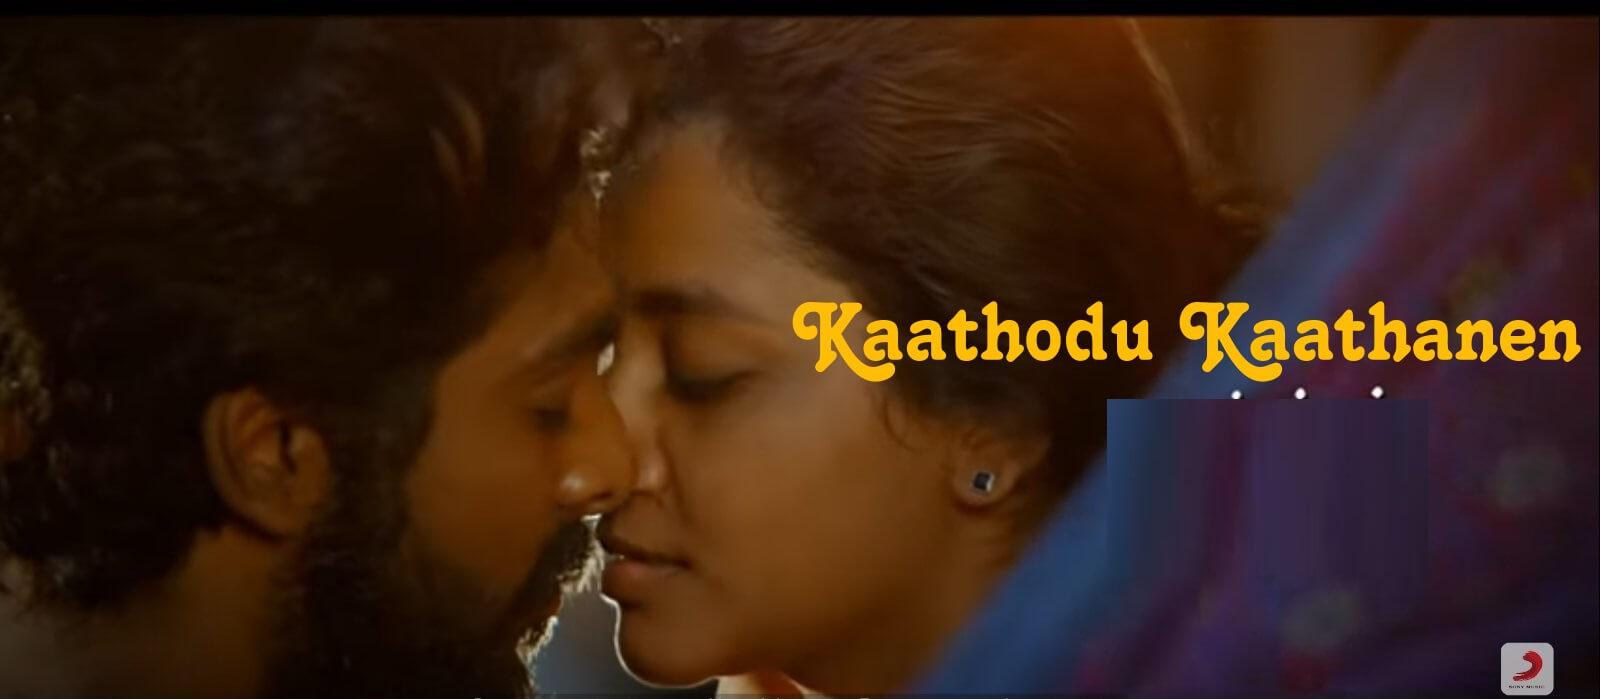 Kaathodu Kaathanen Song download